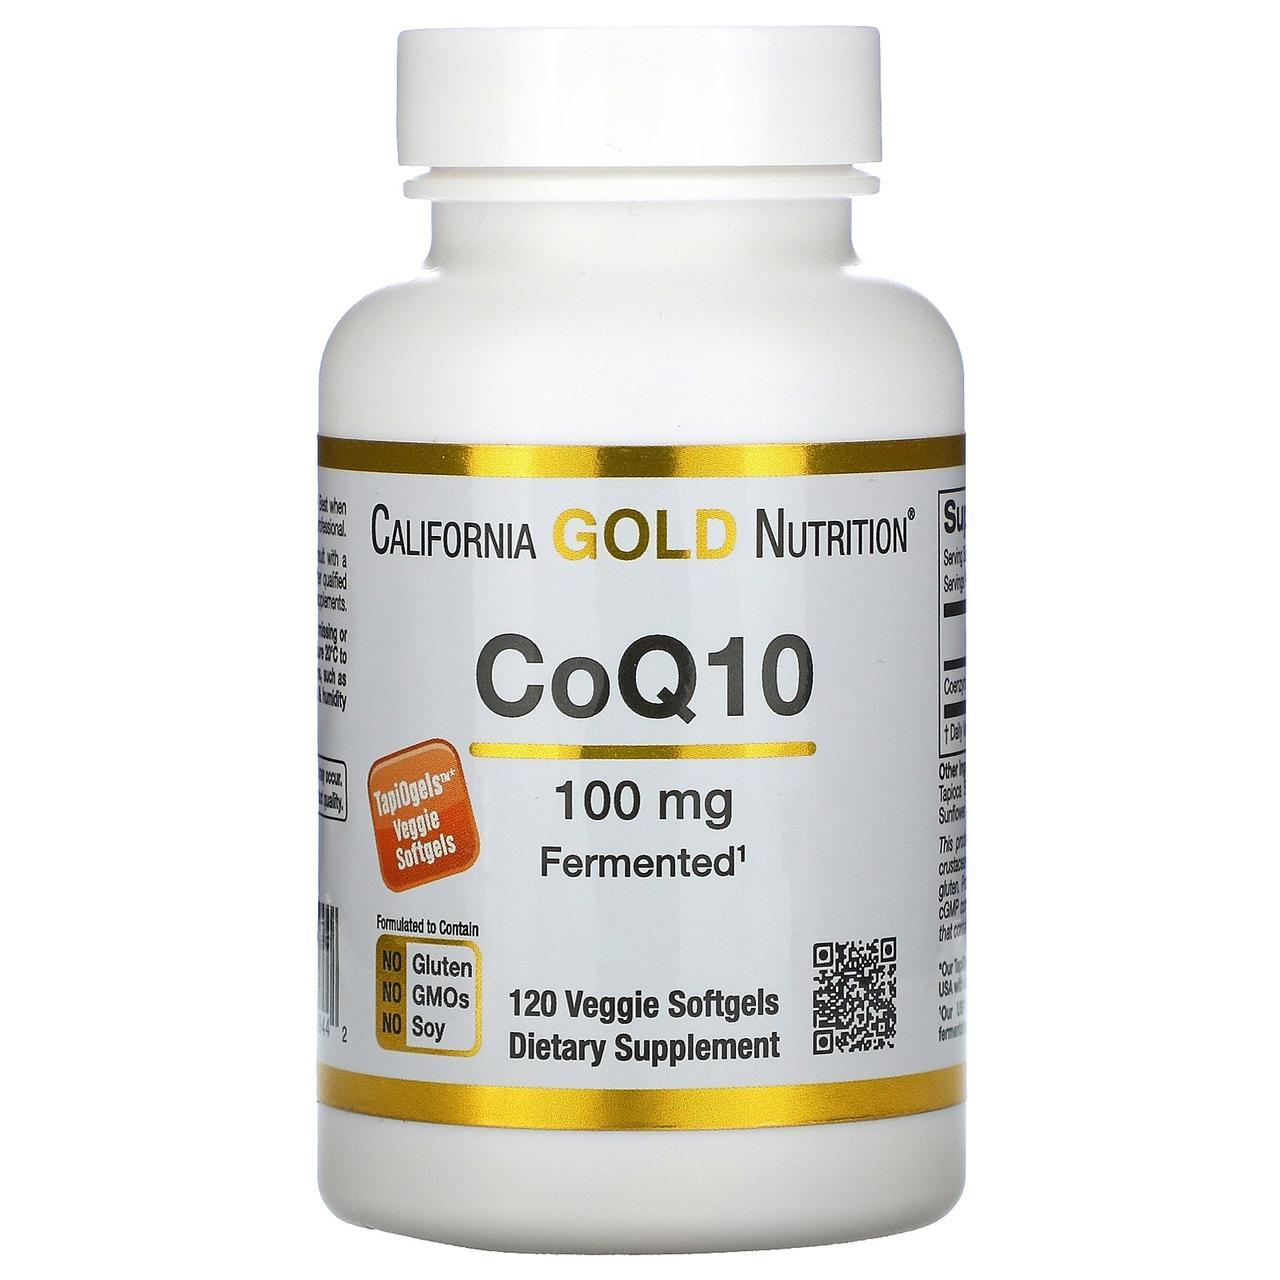 Коэнзим Q10, 100 мг, 120 капсул,California Gold Nutrition, CoQ10, Naturally Fermented